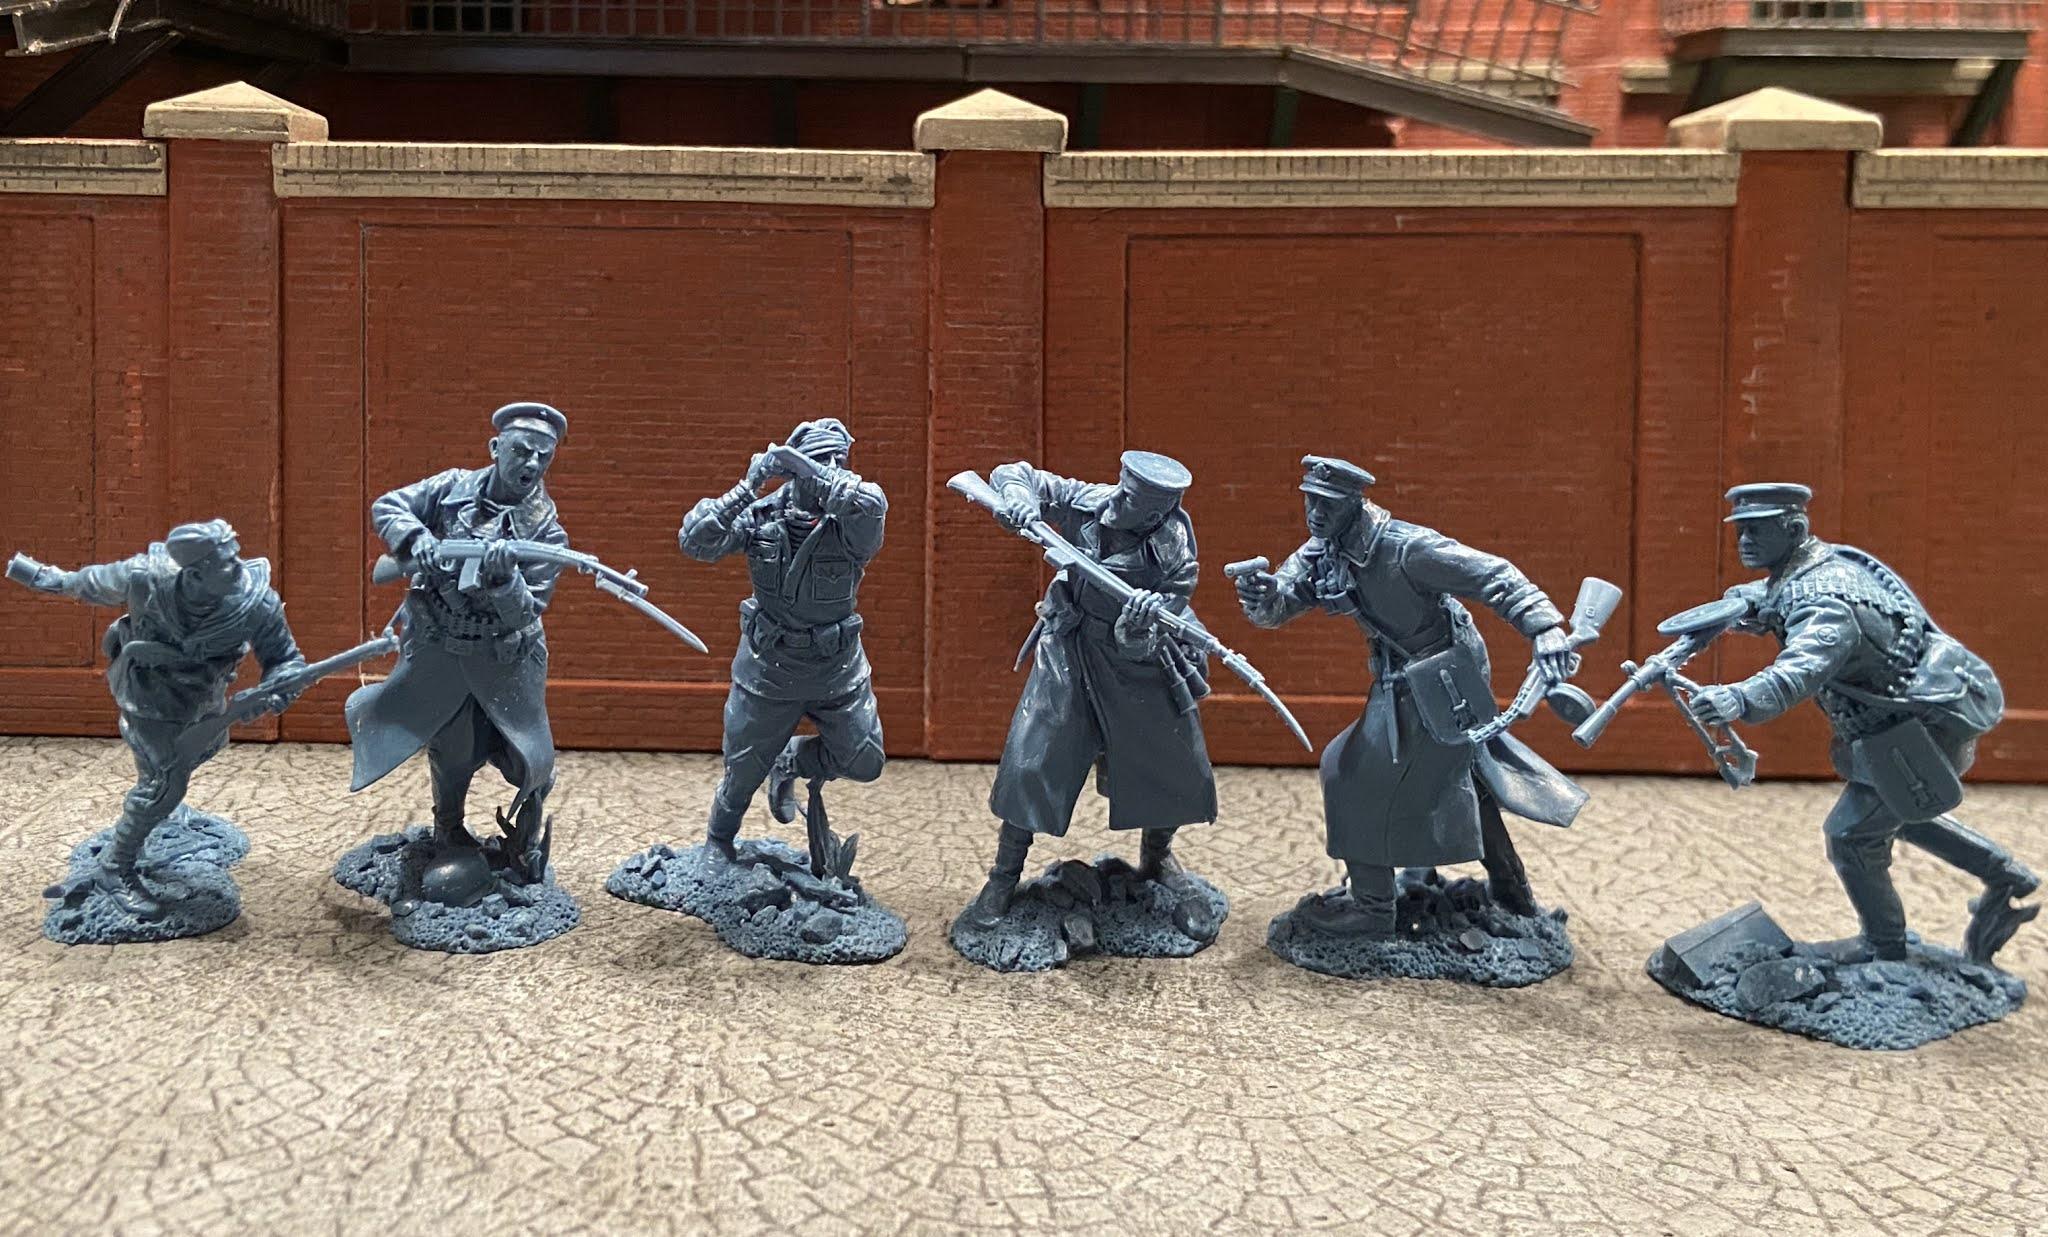 Plastic Platoon Toy Soldiers Soviet Naval Infantry Defense of Leningrad 1941